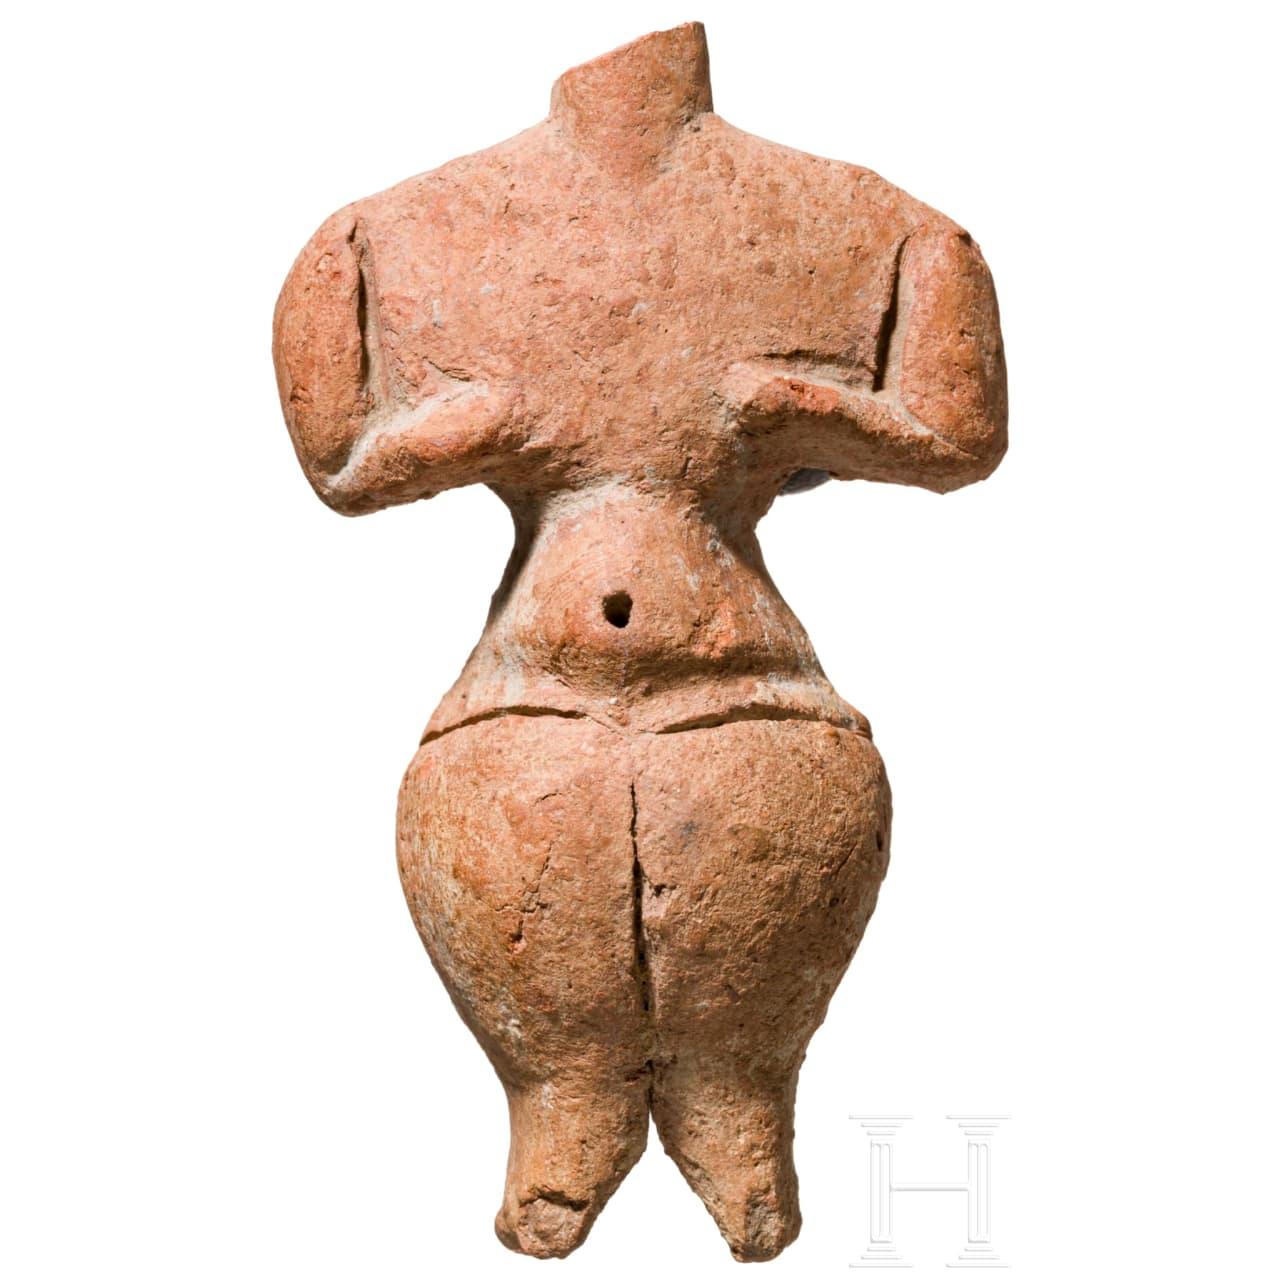 Eindrucksvolles Venusidol, Körös-Kultur, Ungarn, Neolithikum, 4. Jtsd. v. Chr.